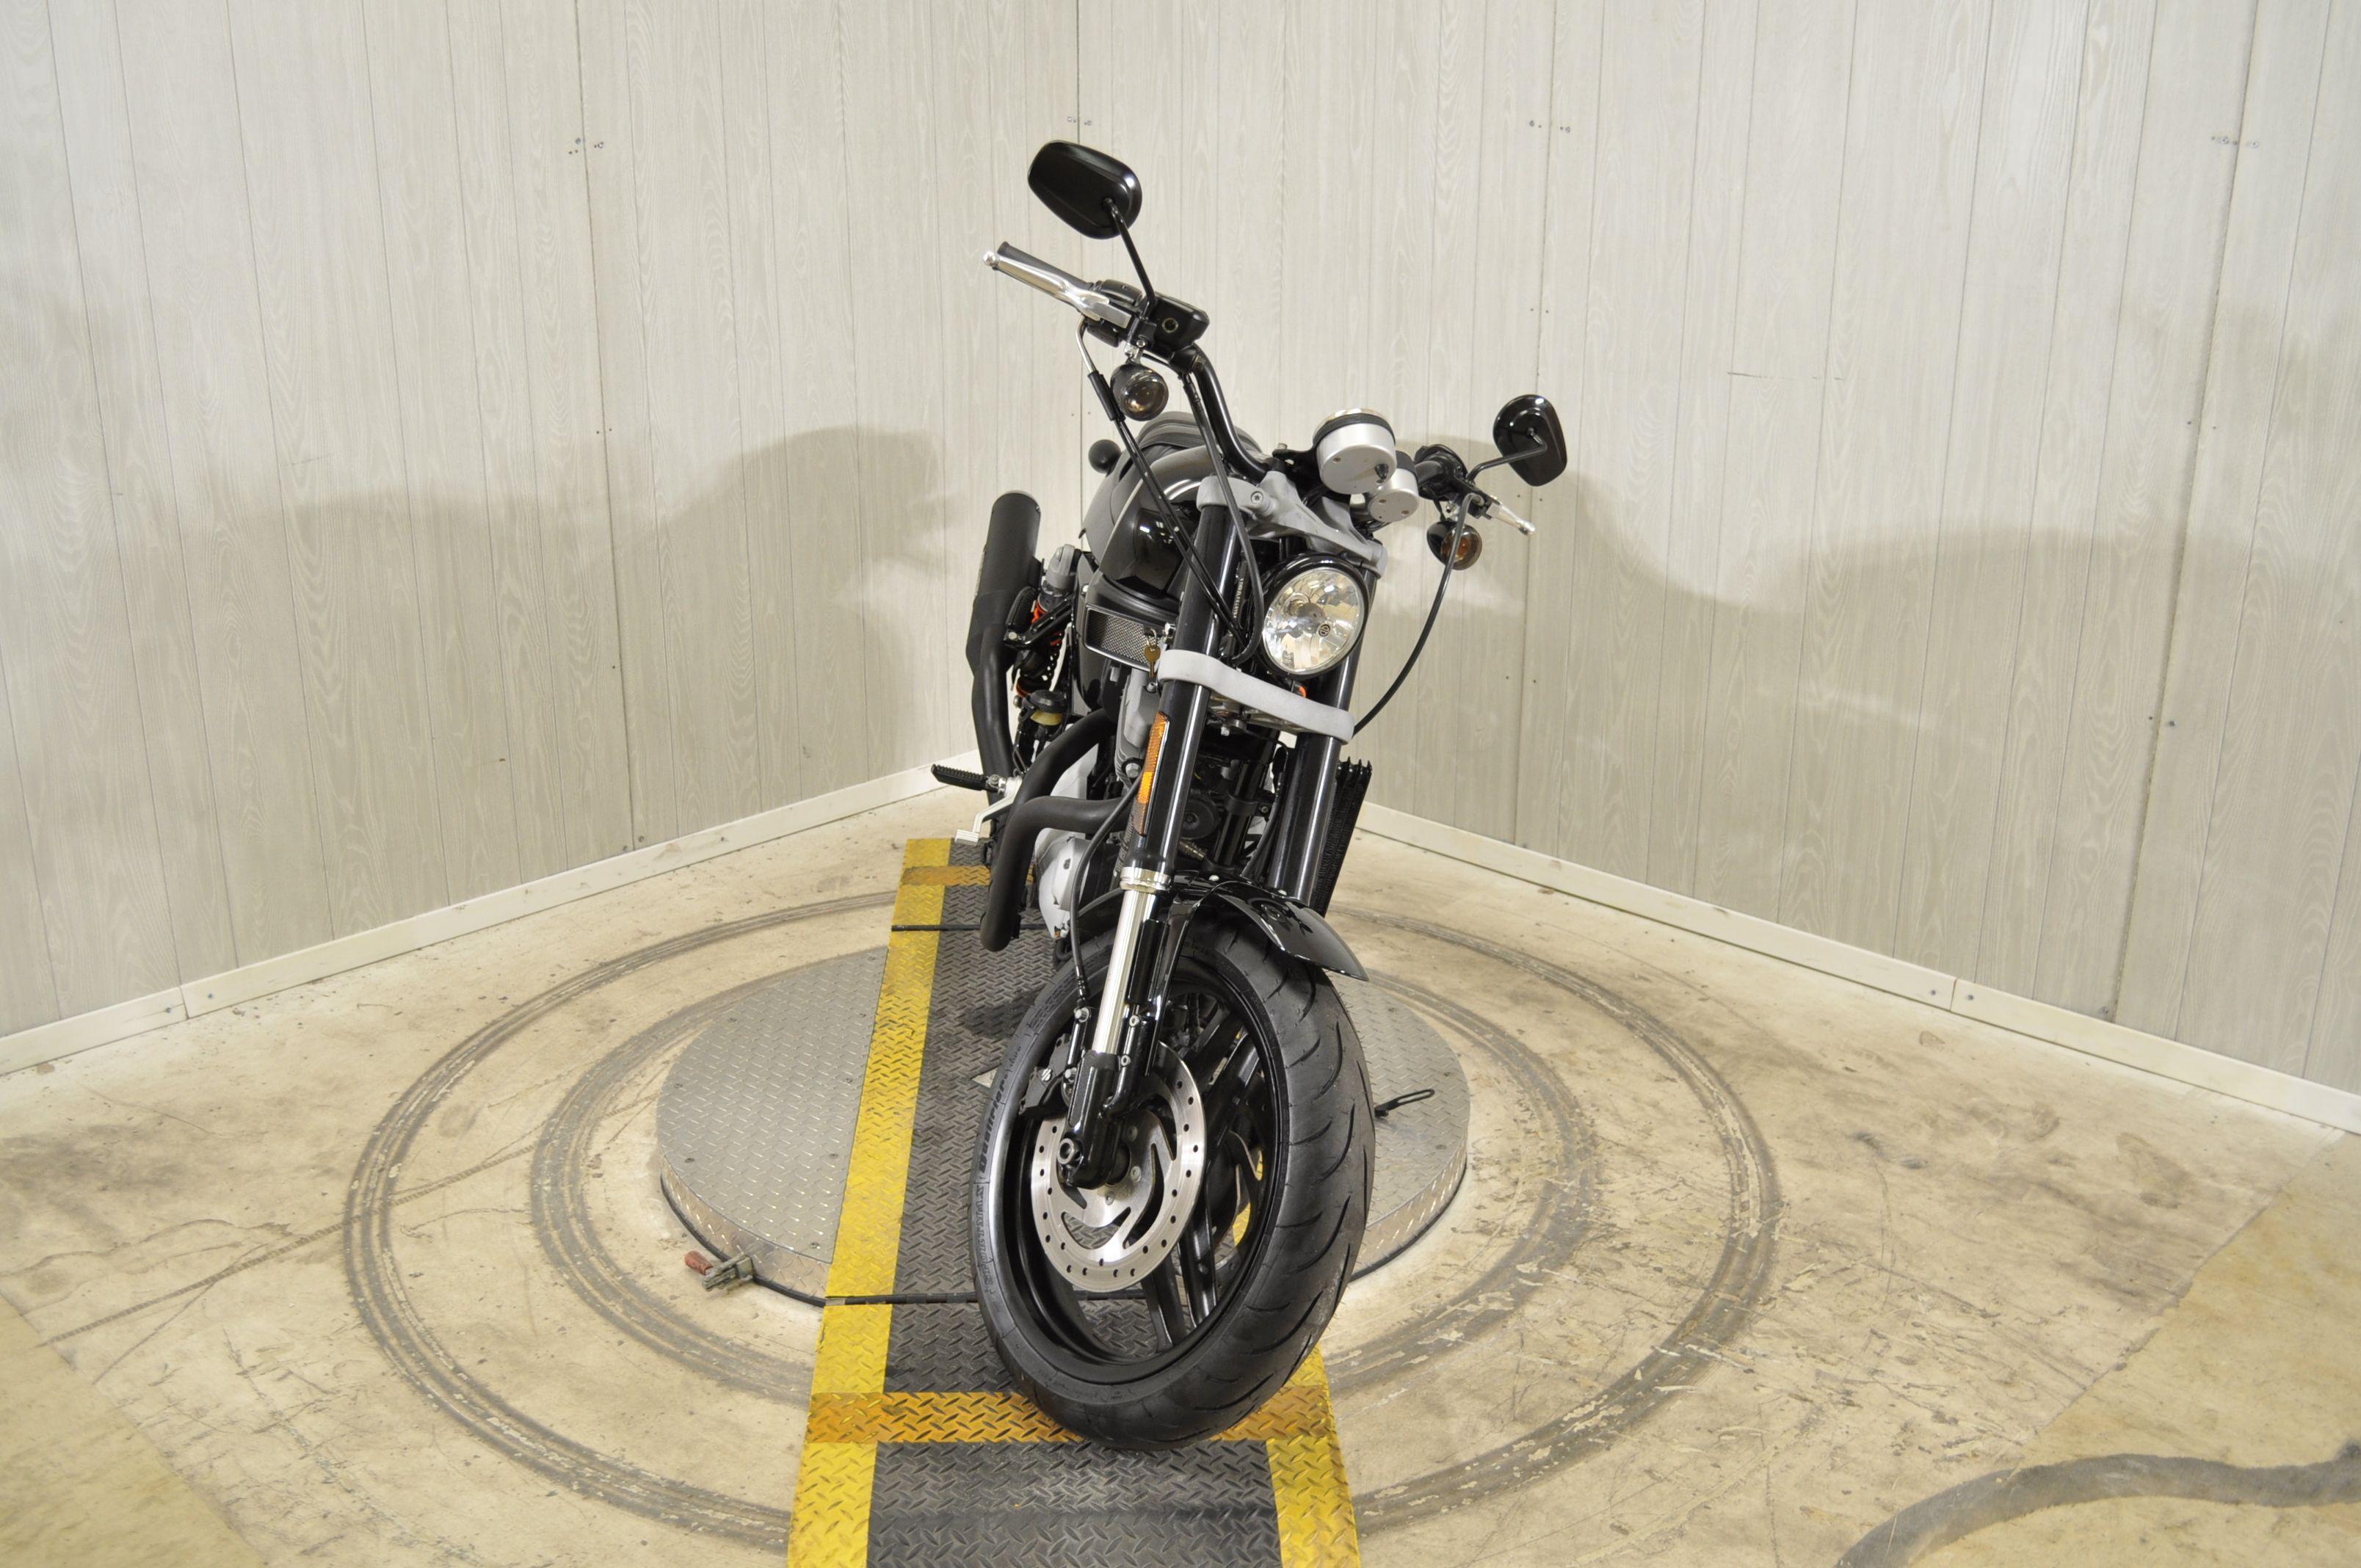 Pre-Owned 2009 Harley-Davidson XR1200 XR1200